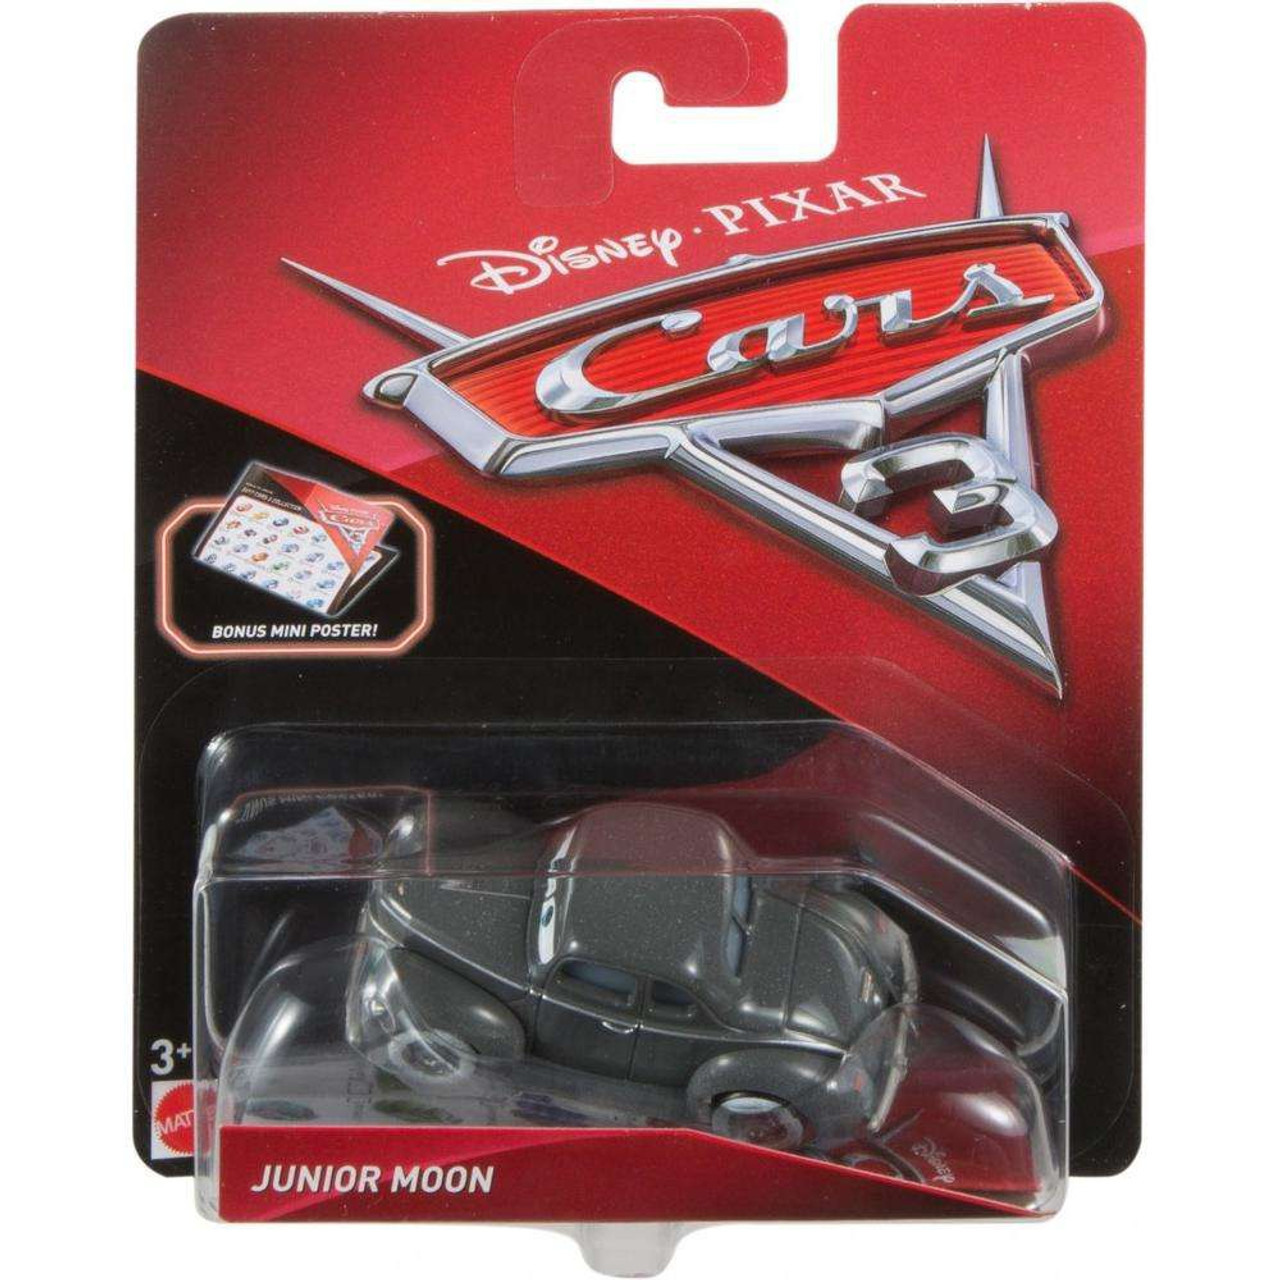 disney pixar cars cars 3 junior moon 155 diecast car mini poster